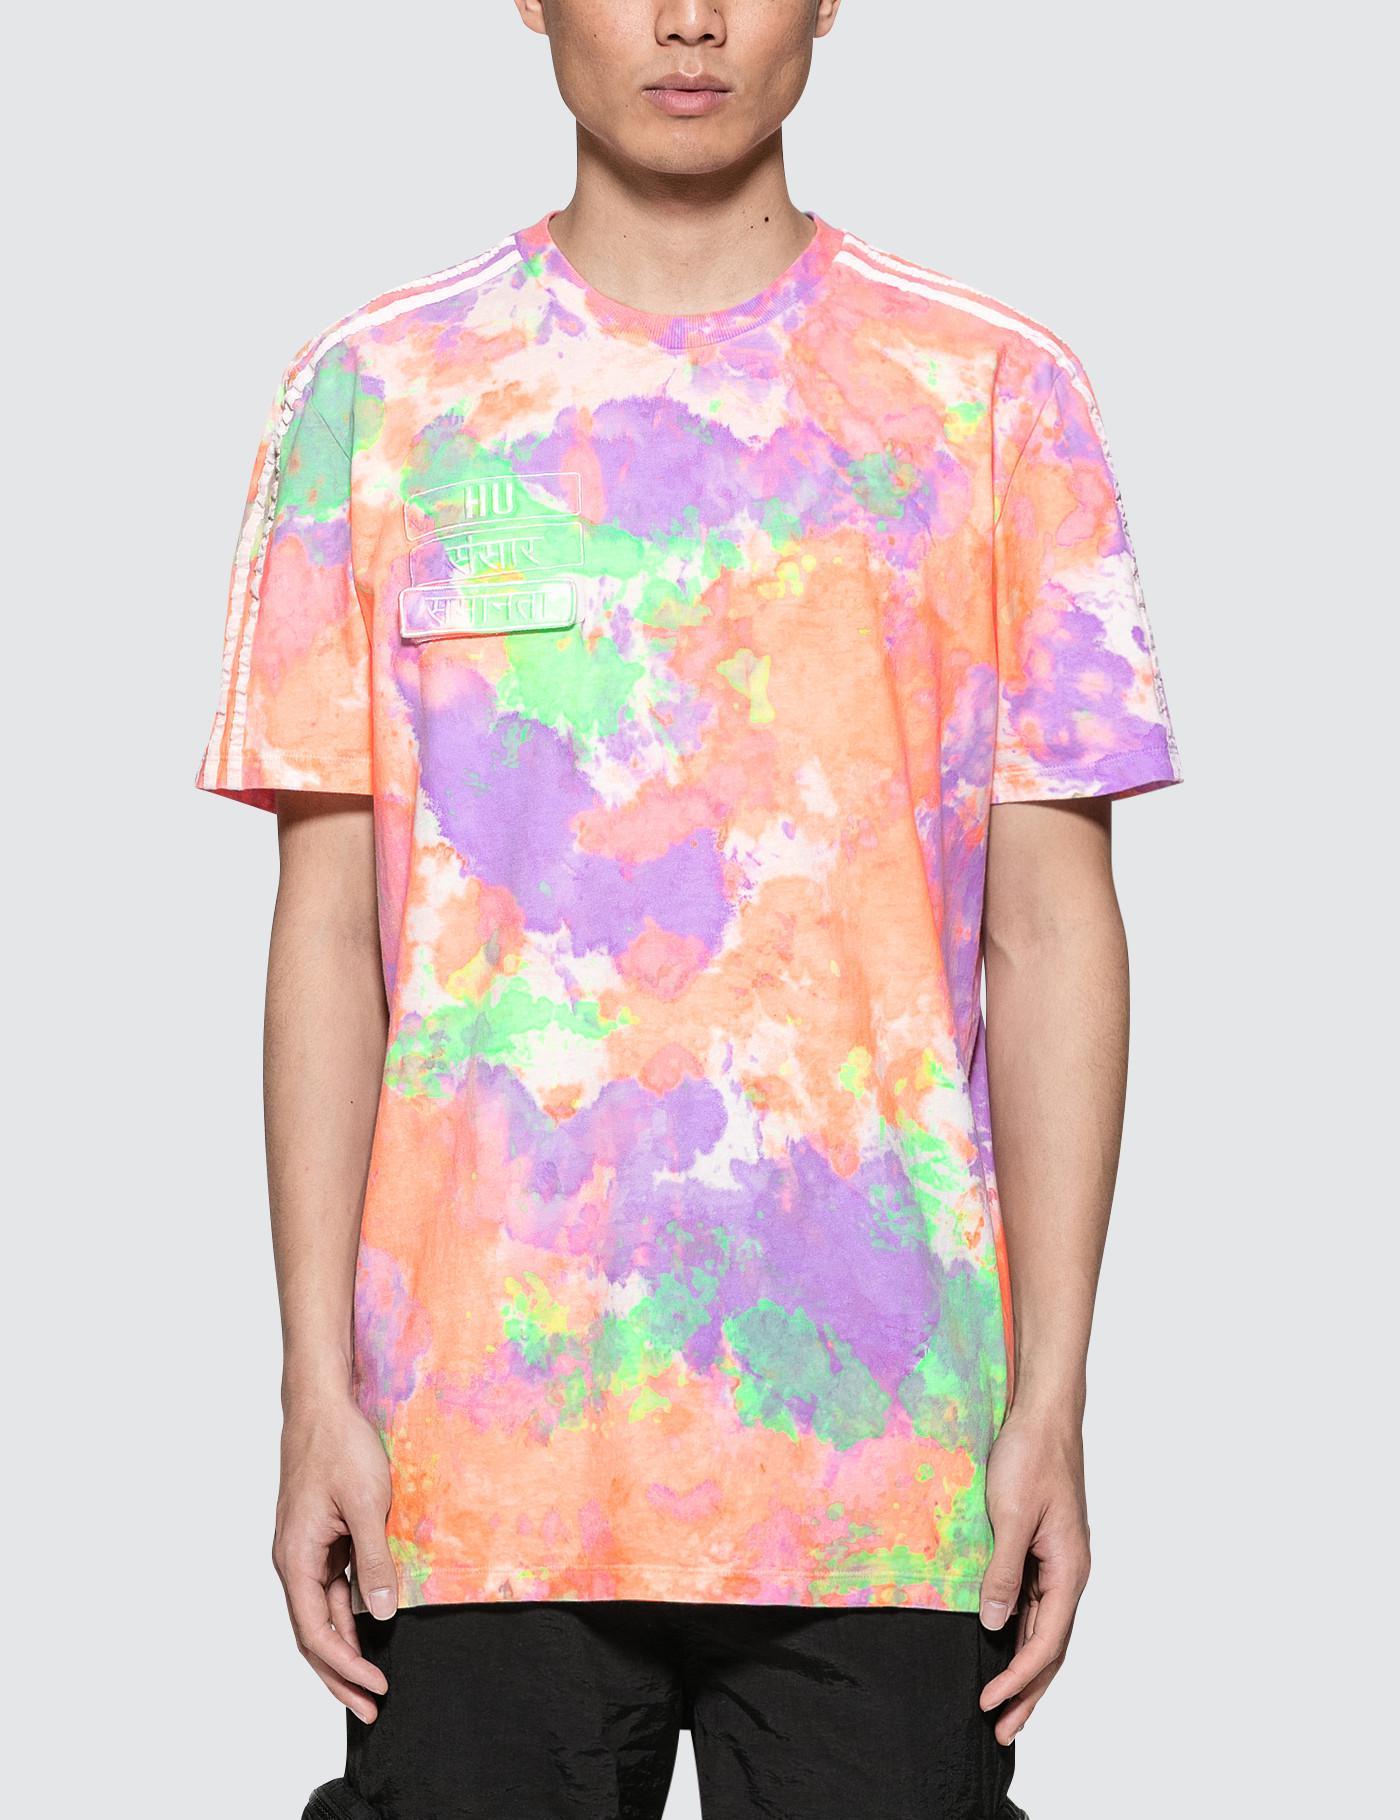 Pharrell Williams X Adidas Originali Adidas Hu Holi T - Shirt Per Gli Uomini.